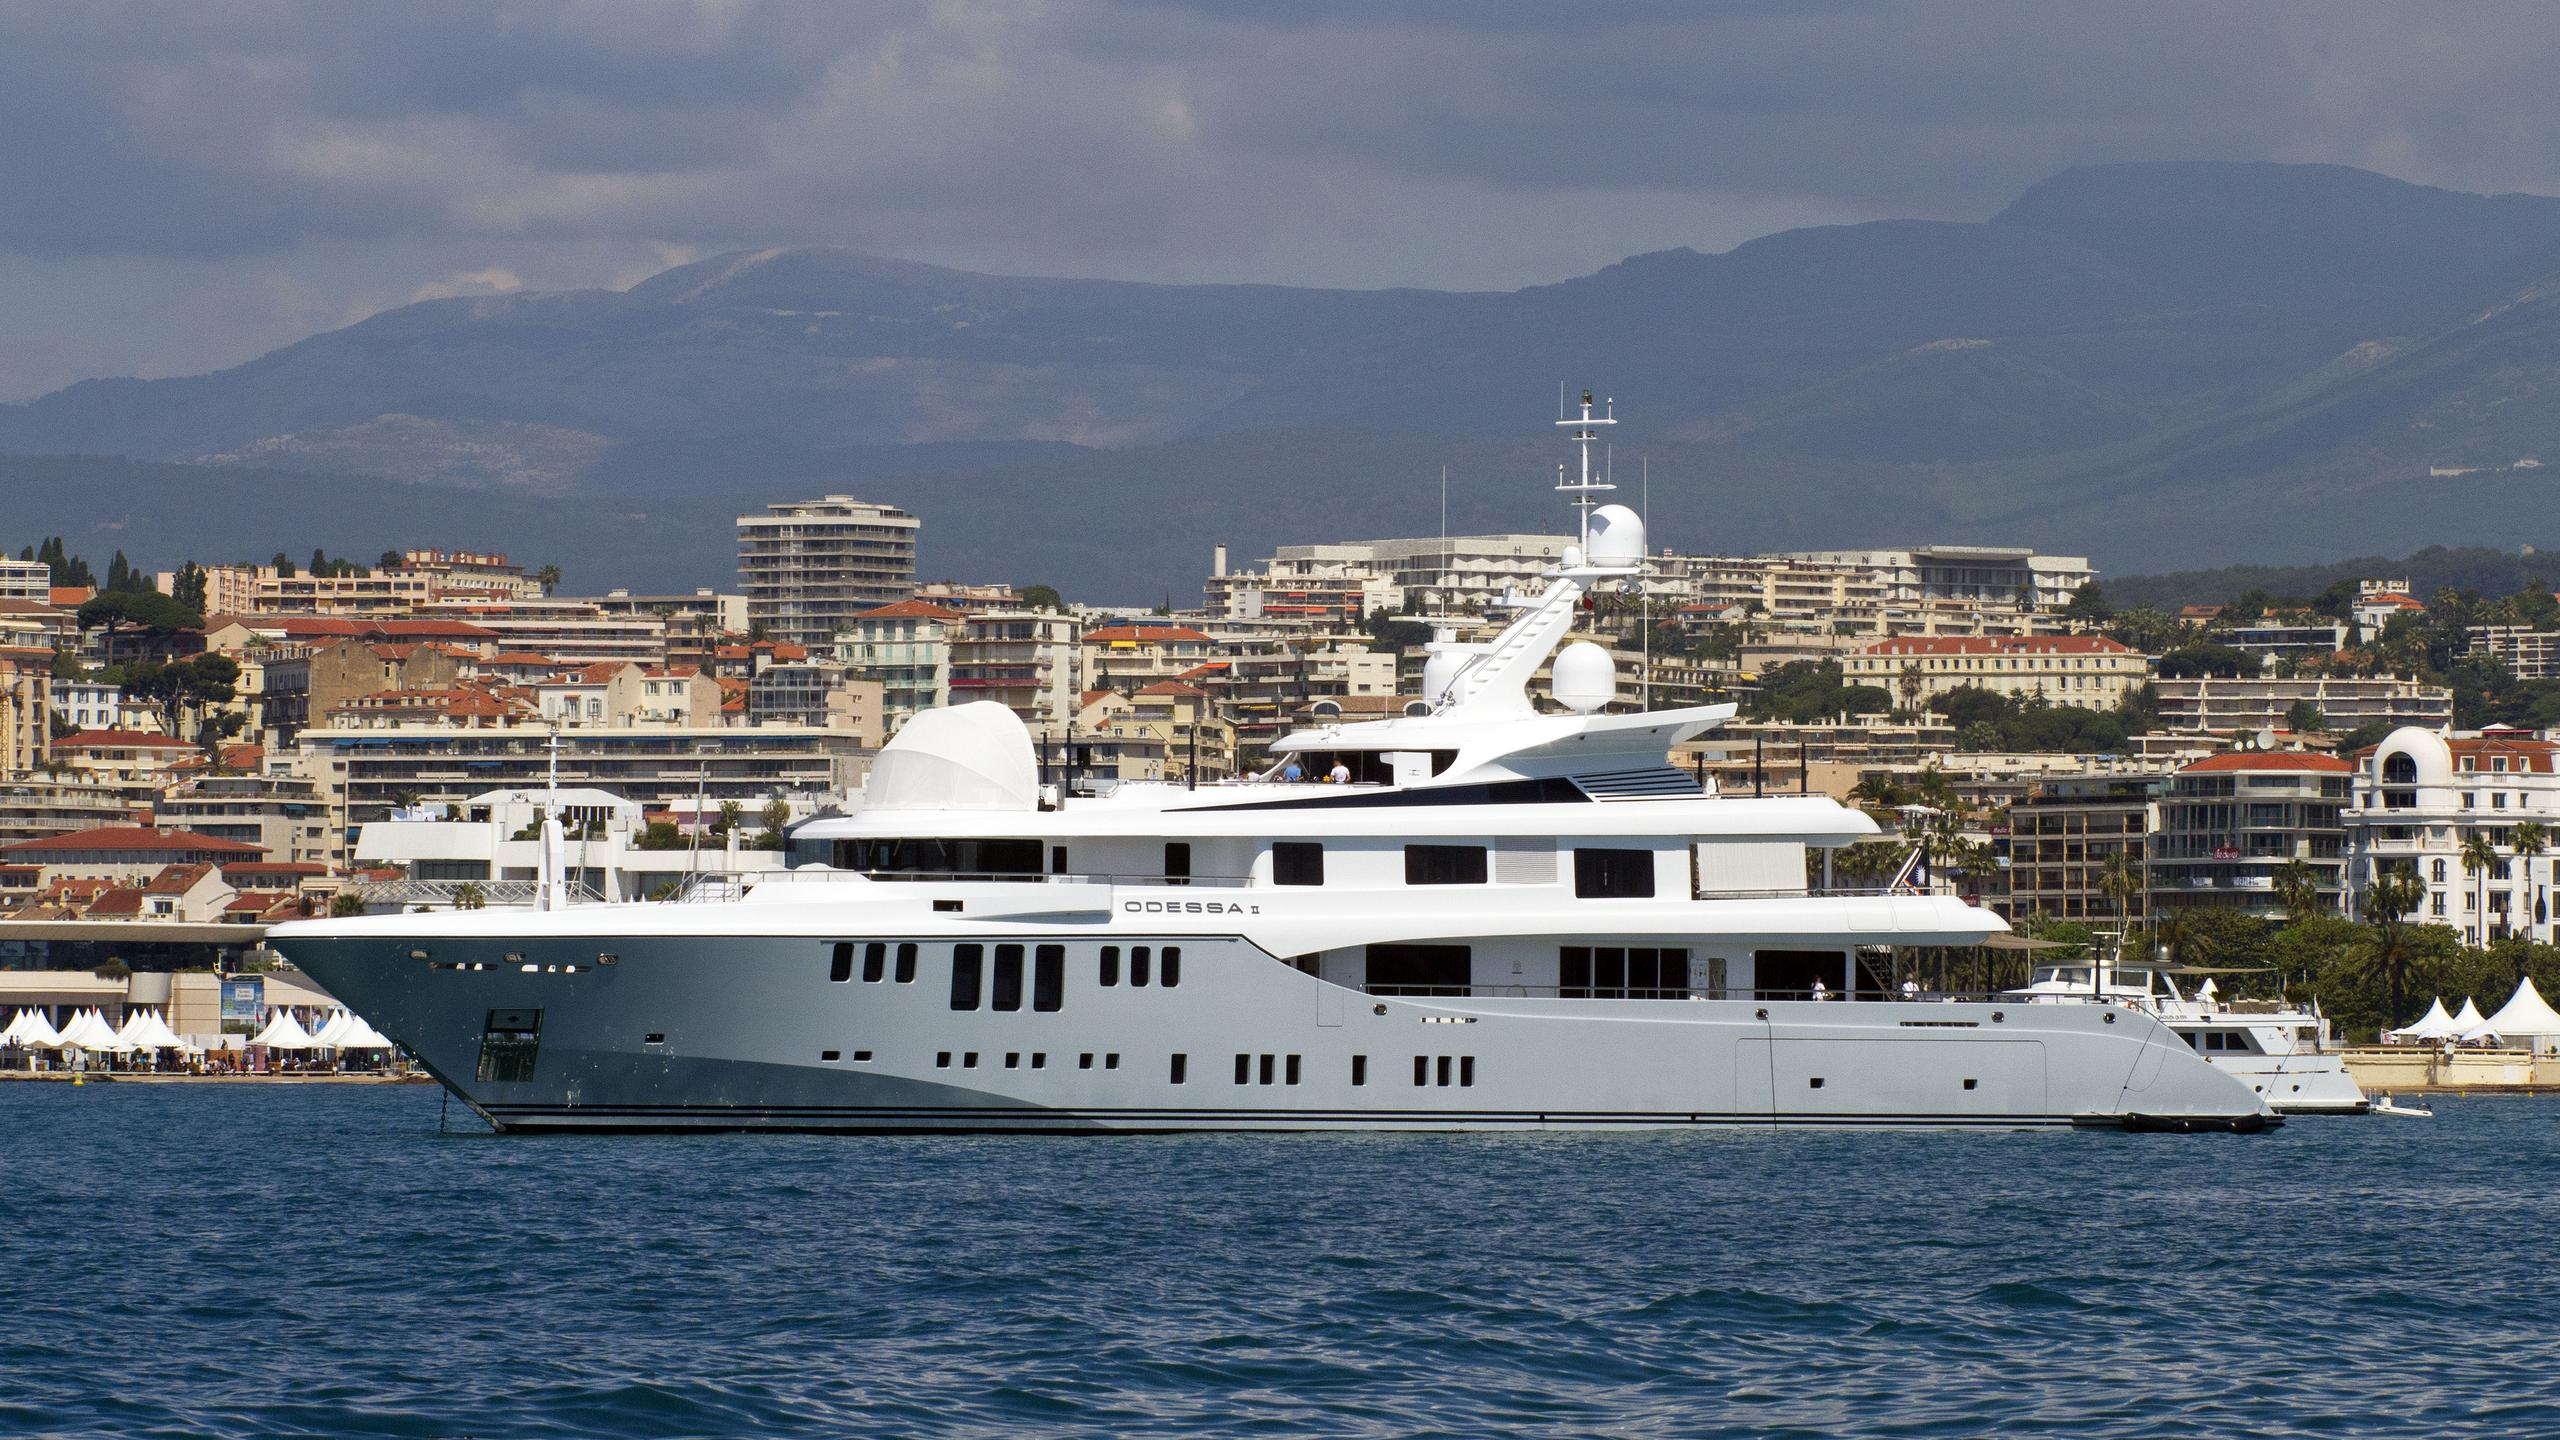 odessa-ii-motor-yacht-nobiskrug-2013-73m-profile-off-croisette